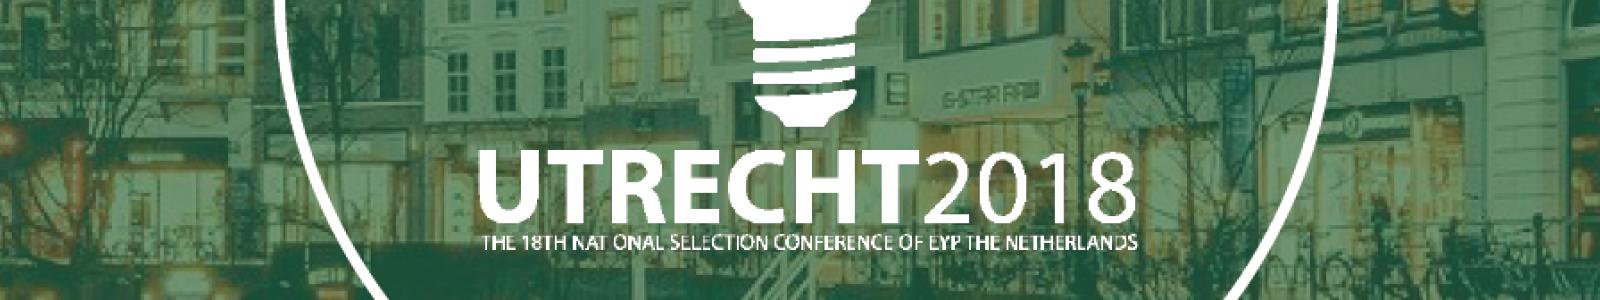 Selectieconferentie Europees Jeugdparlement